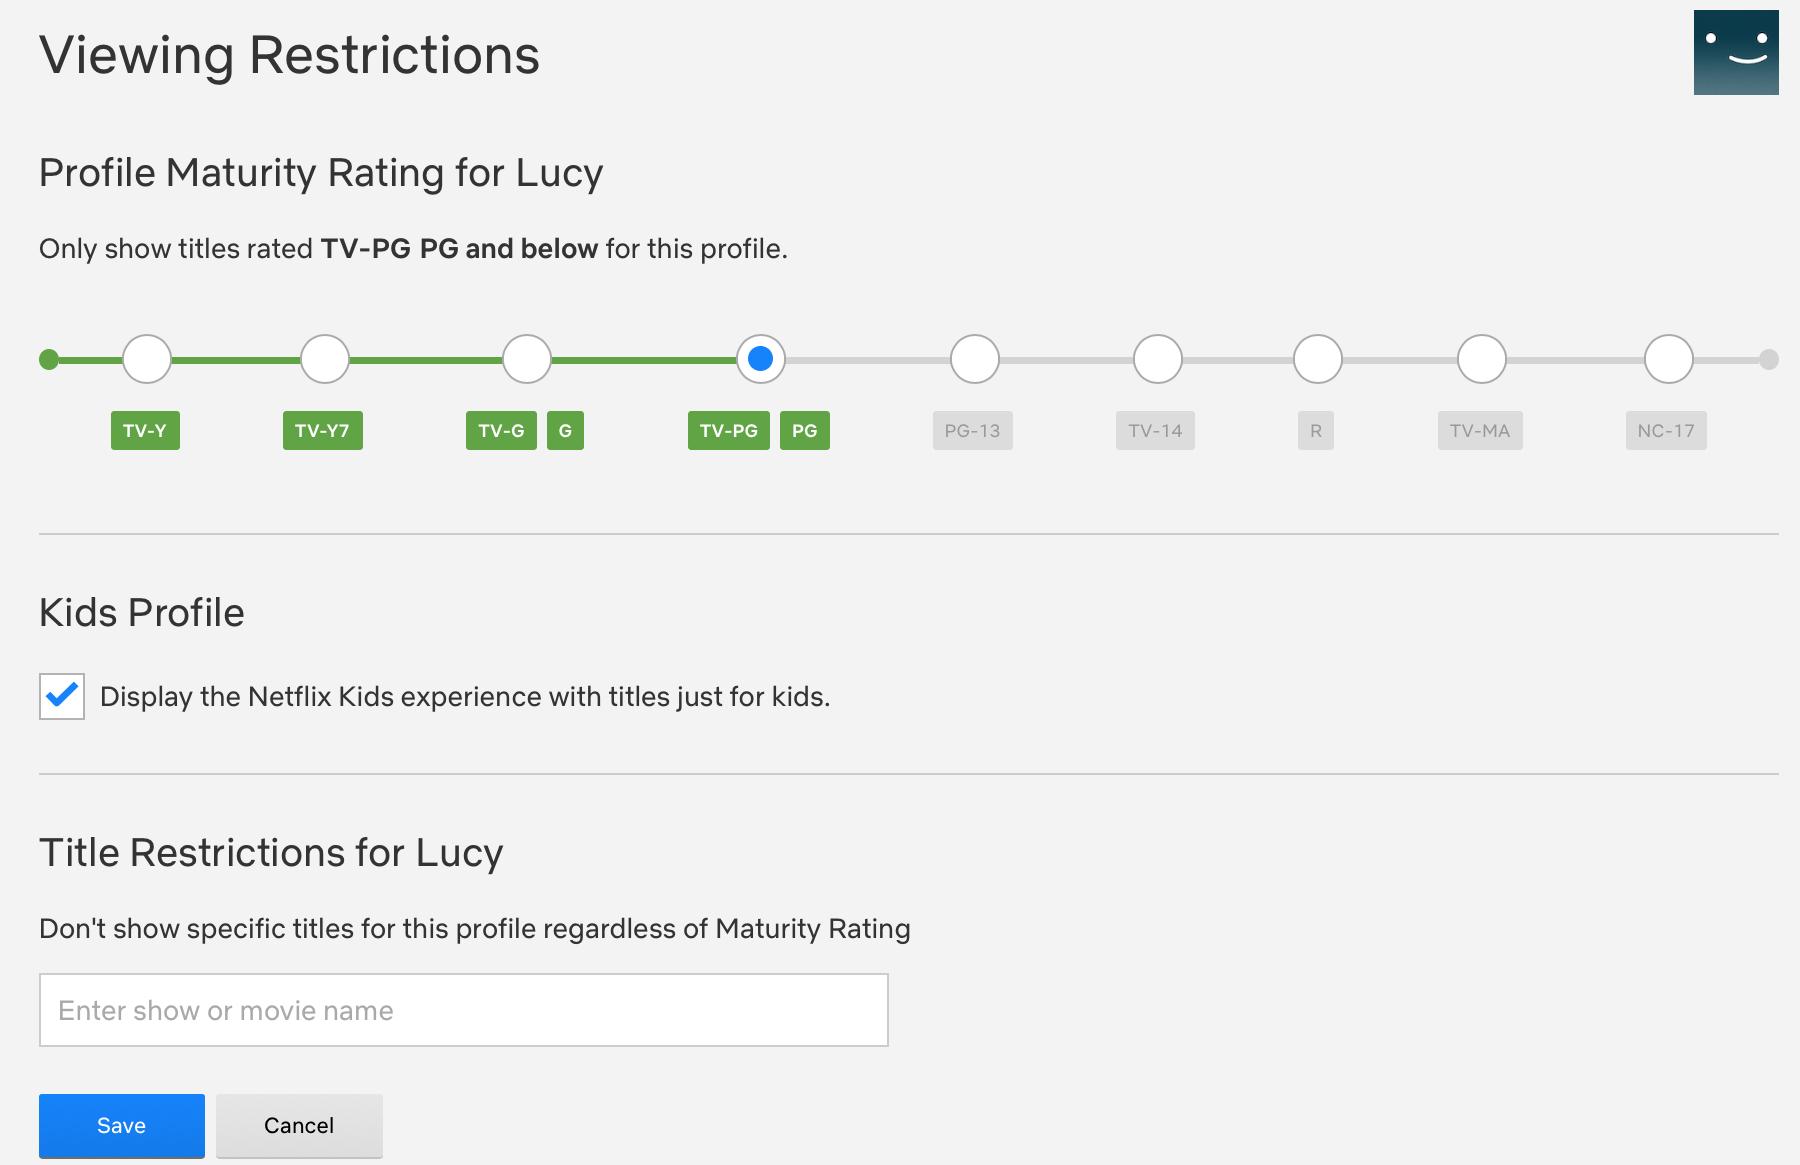 Netflix Kids Viewing Restrictions Web